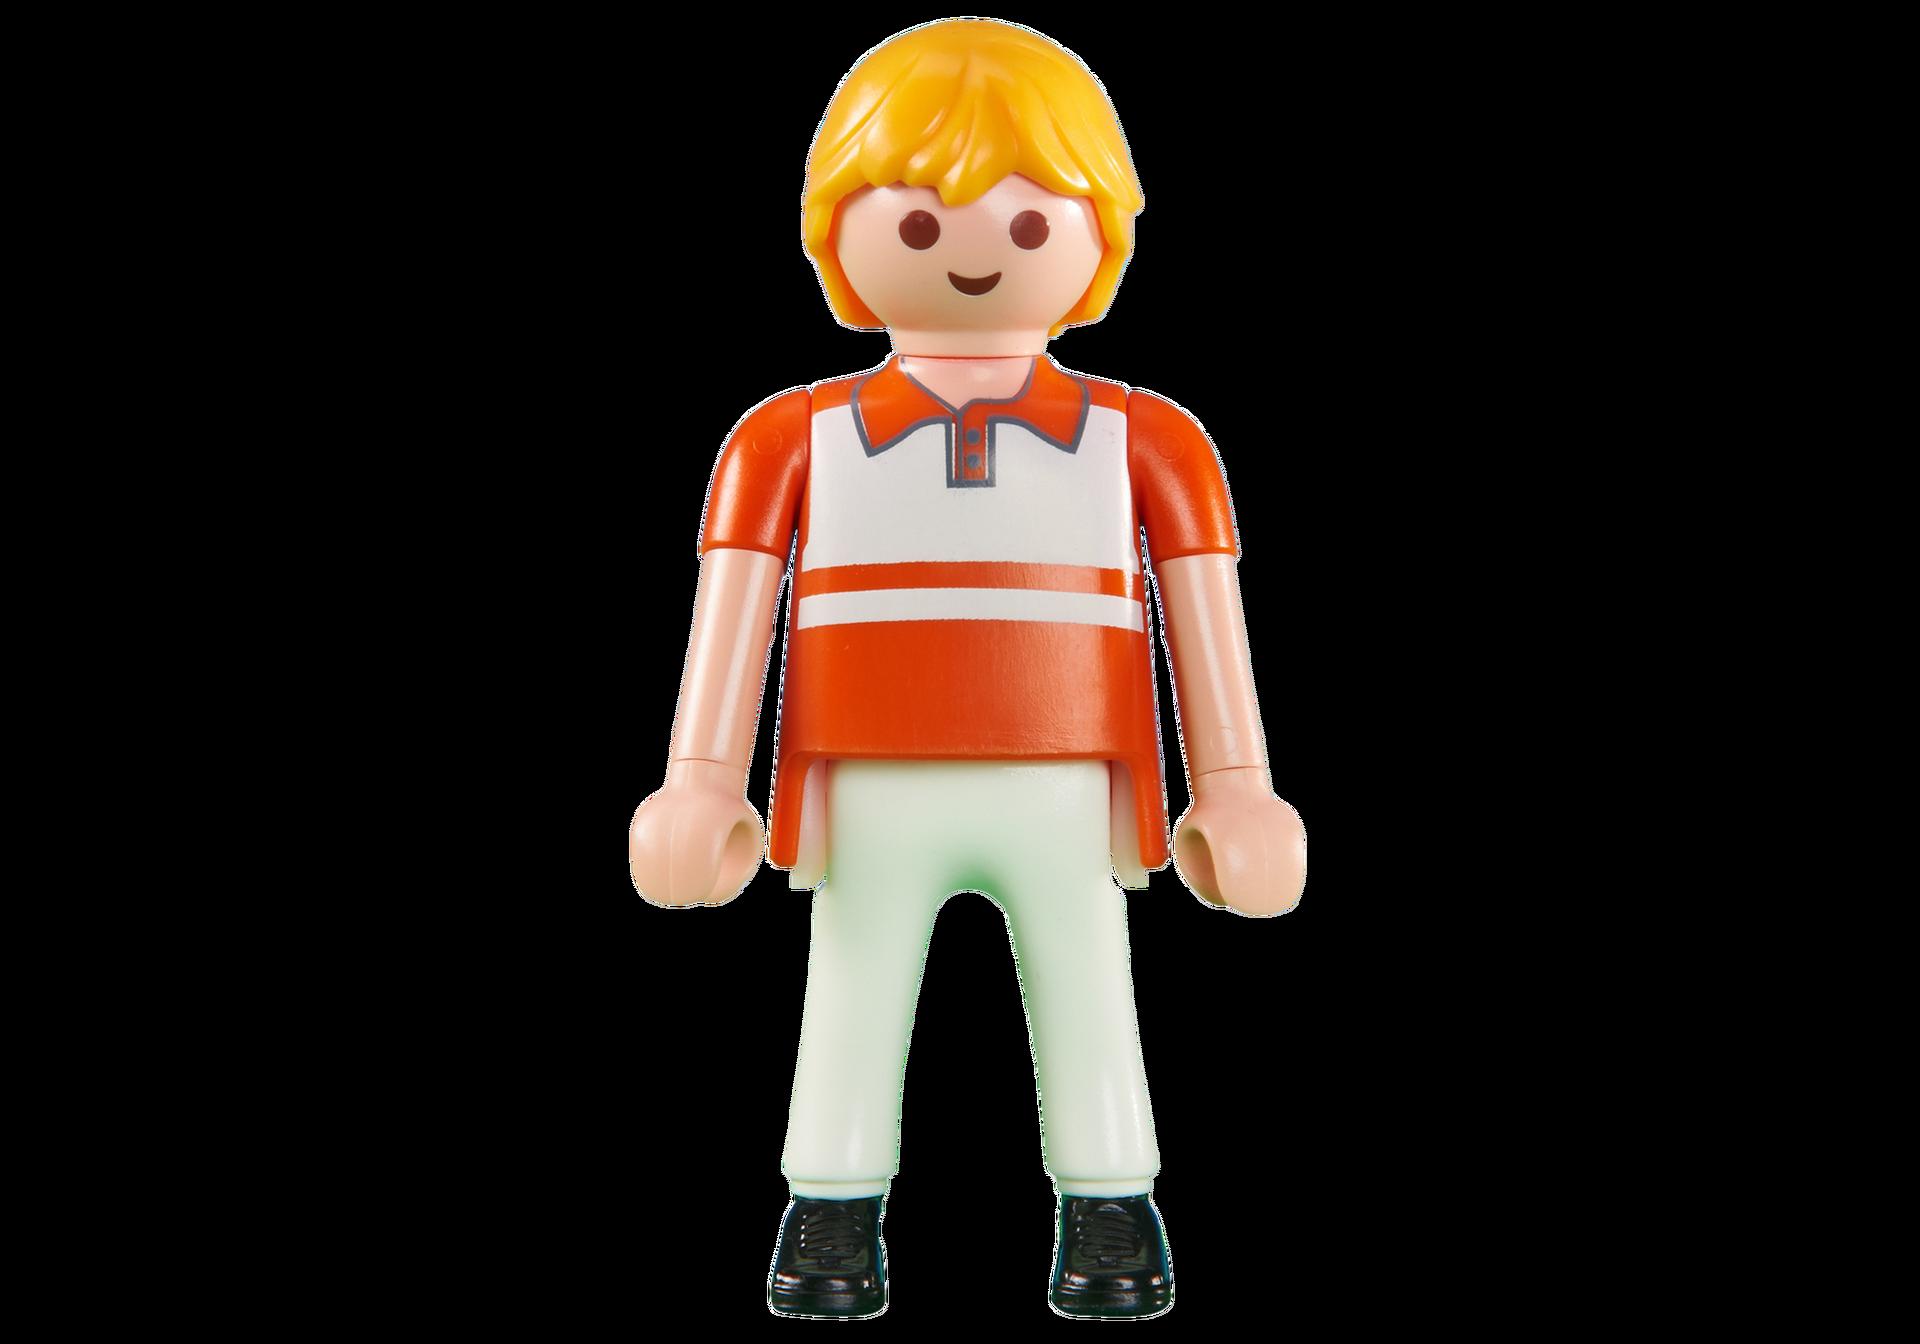 figure - 30004912 - playmobil